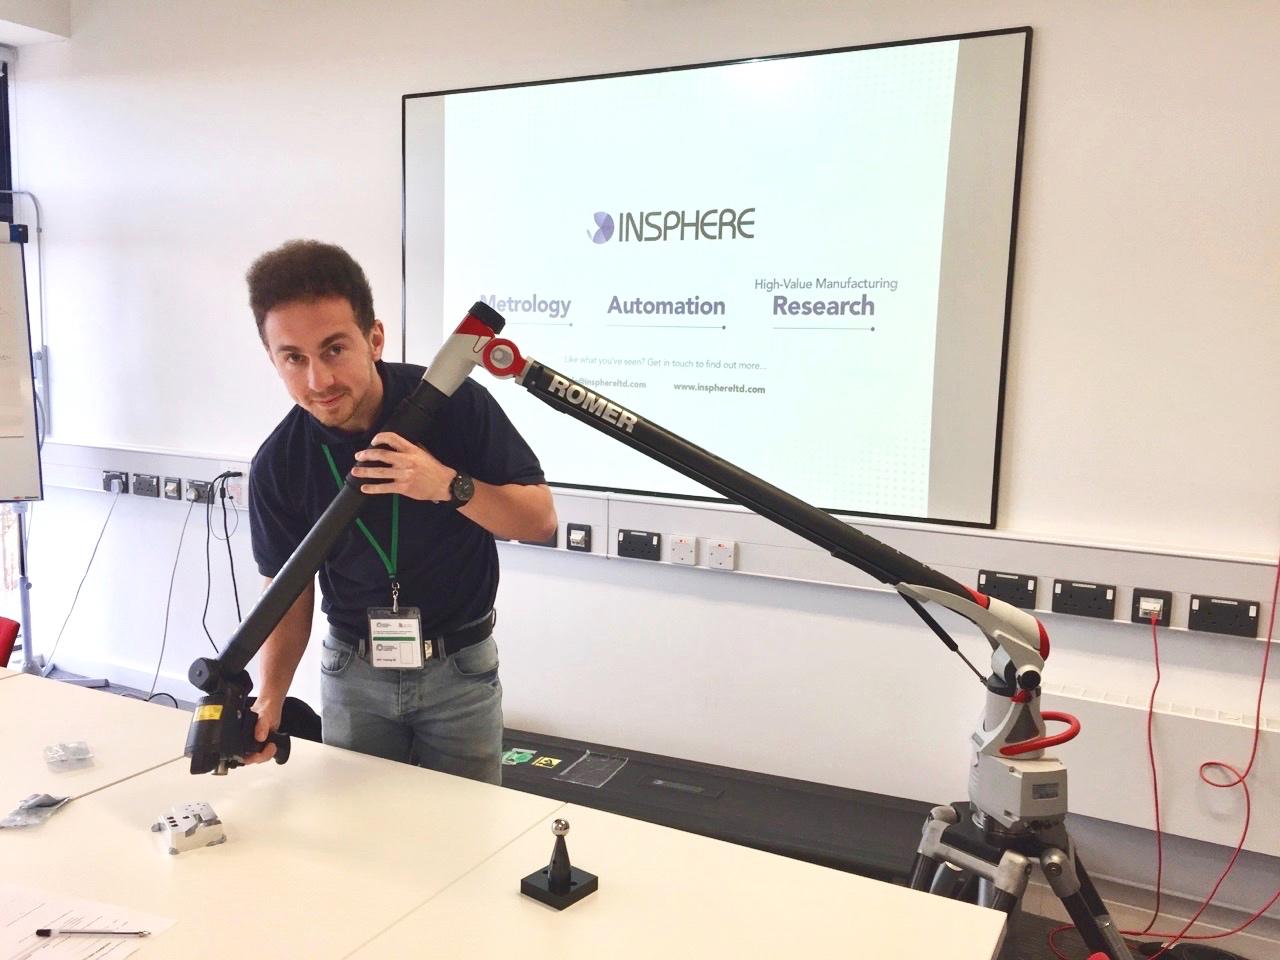 INSPHERE+Portable+Measurement+Training.jpg